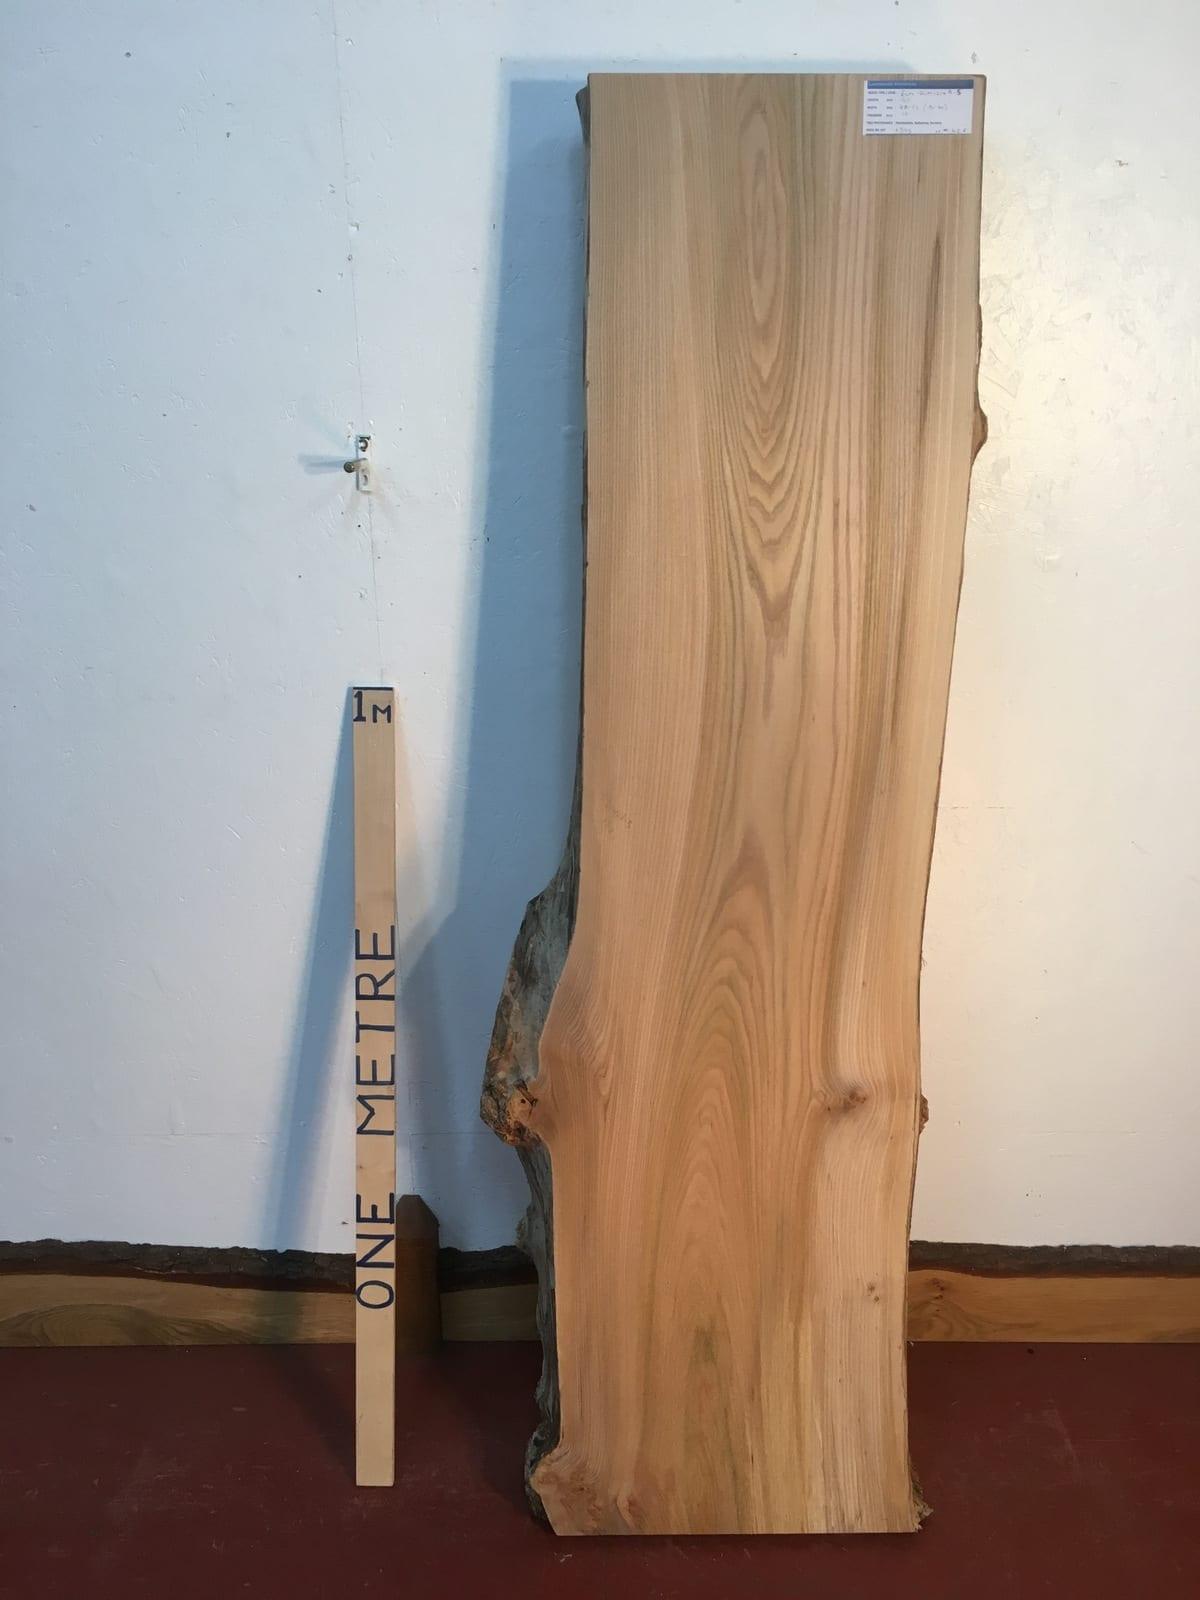 ELM 1214A-5 Natural Waney Live Edge Slab Planed Hardwood Kiln Dried Seasoned Board 10cm thick